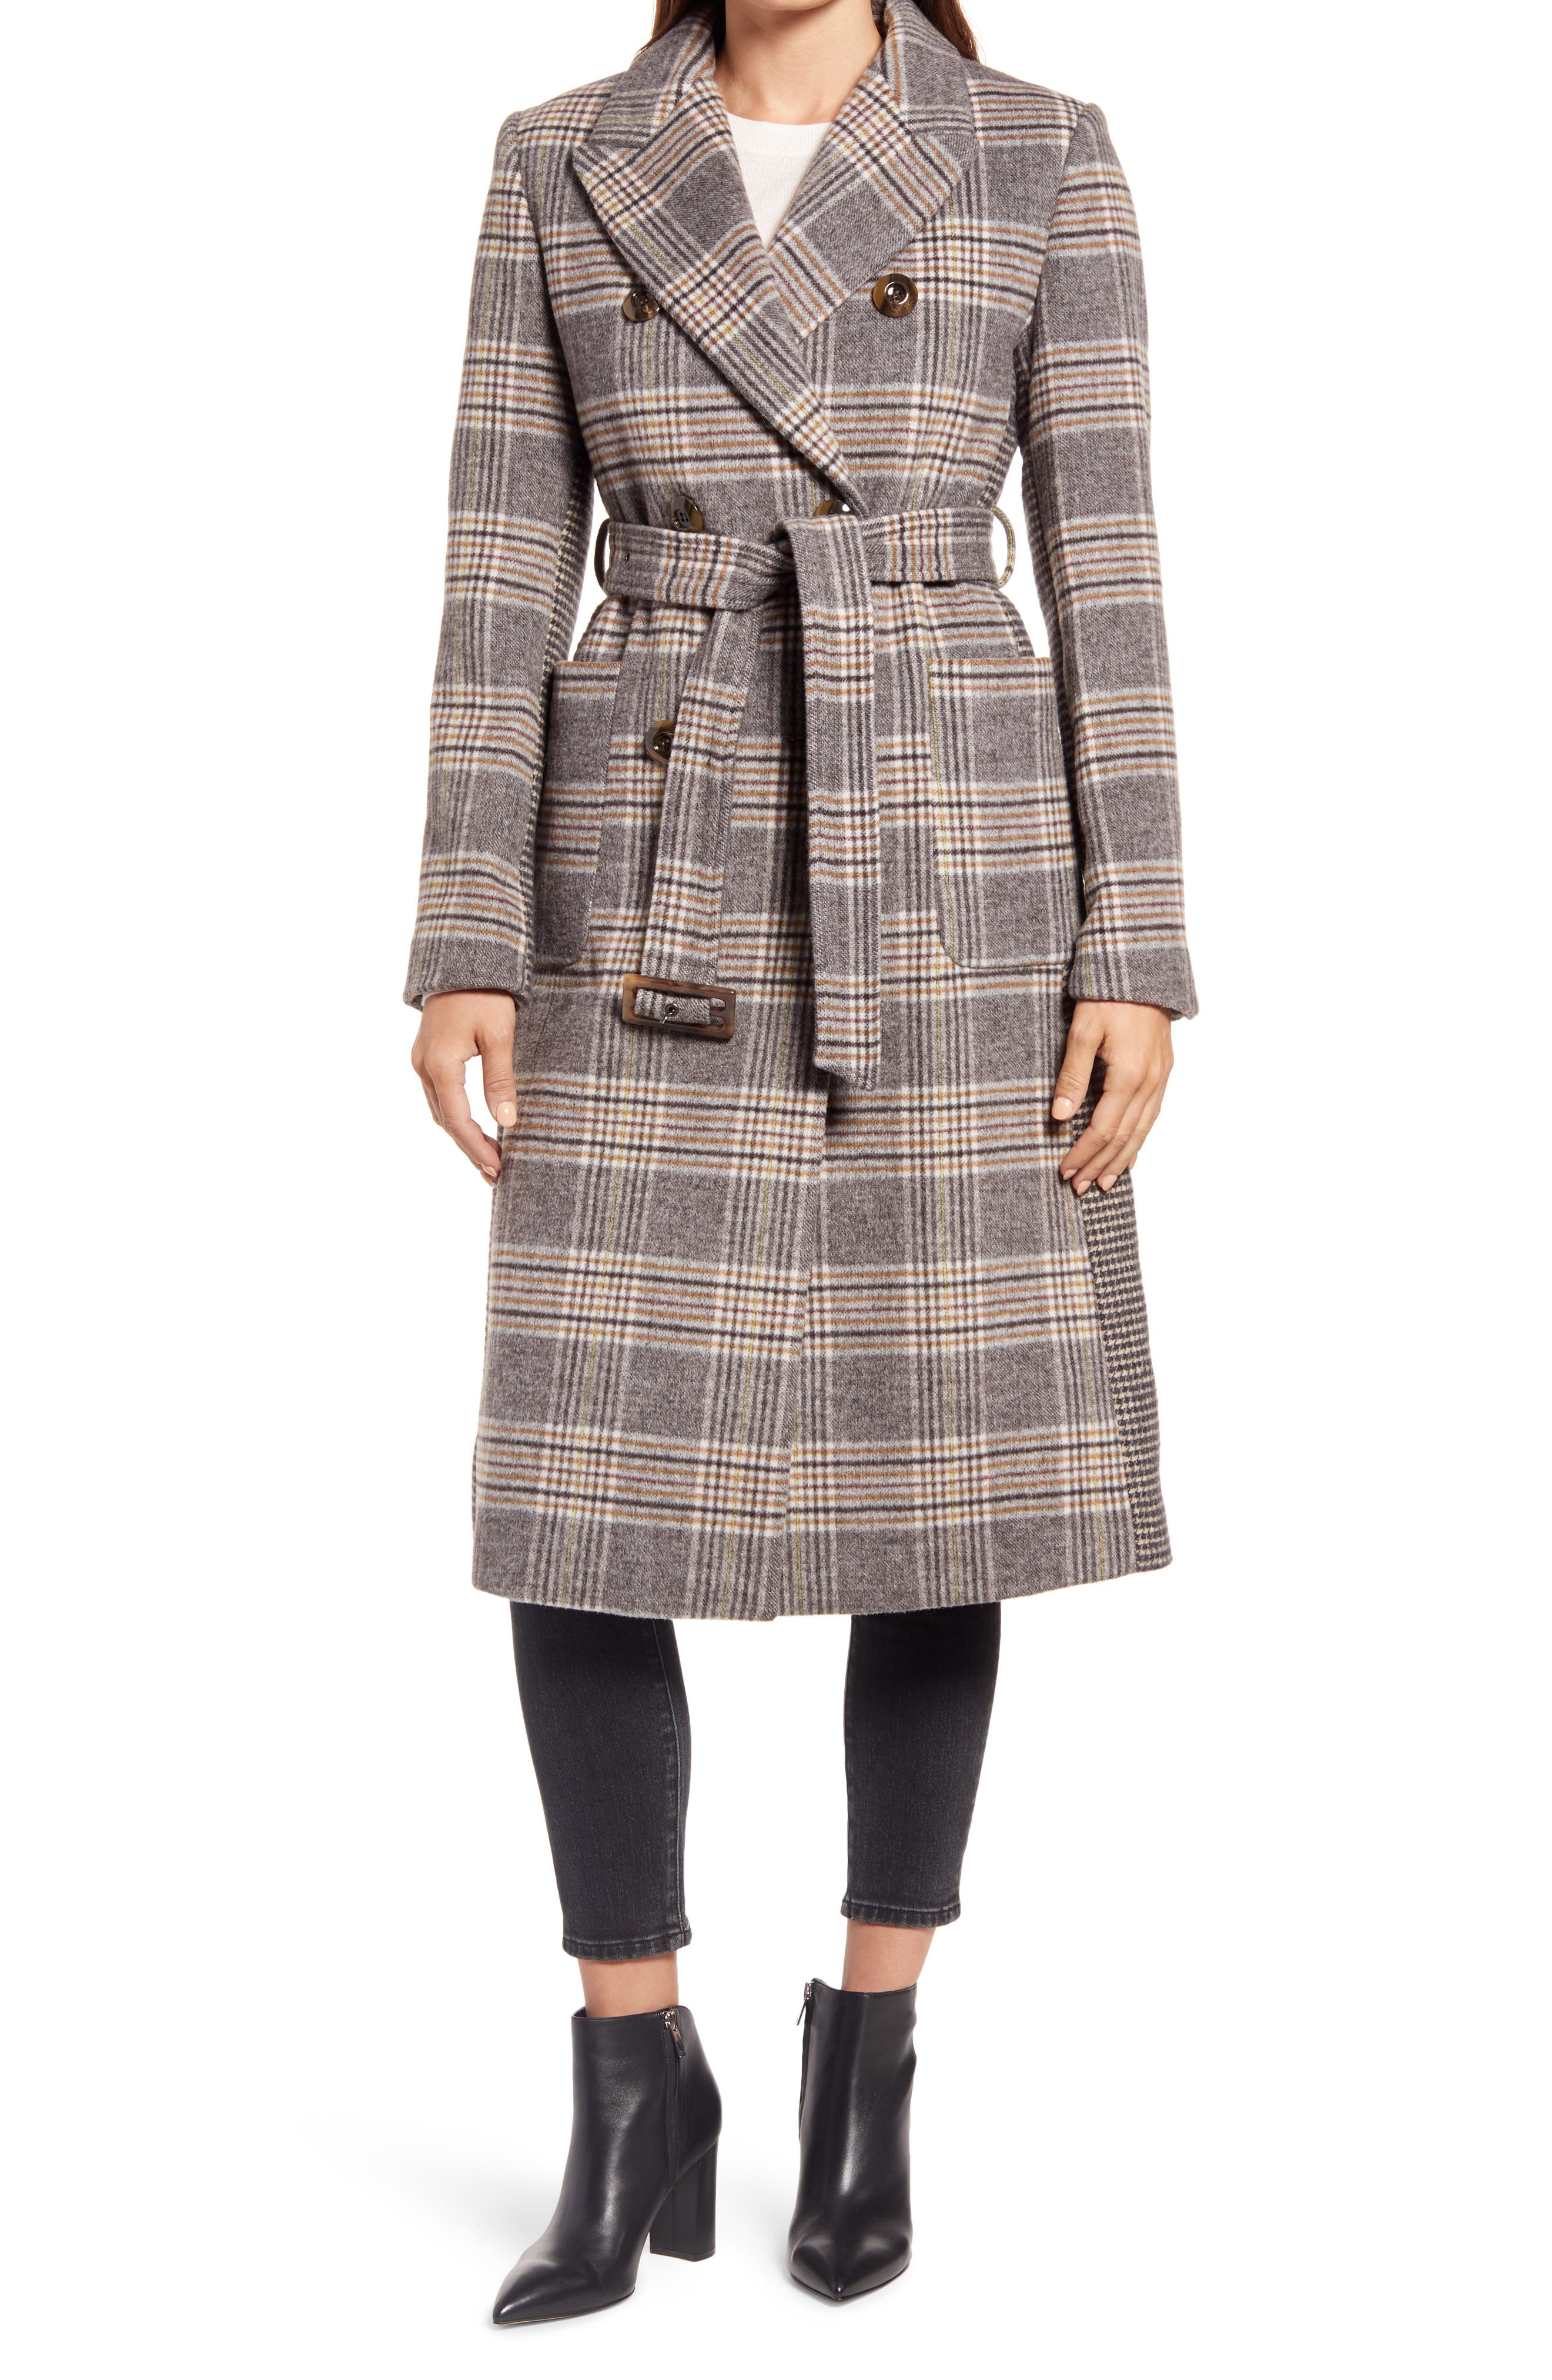 Mix Plaid Belted Wool Blend Coat